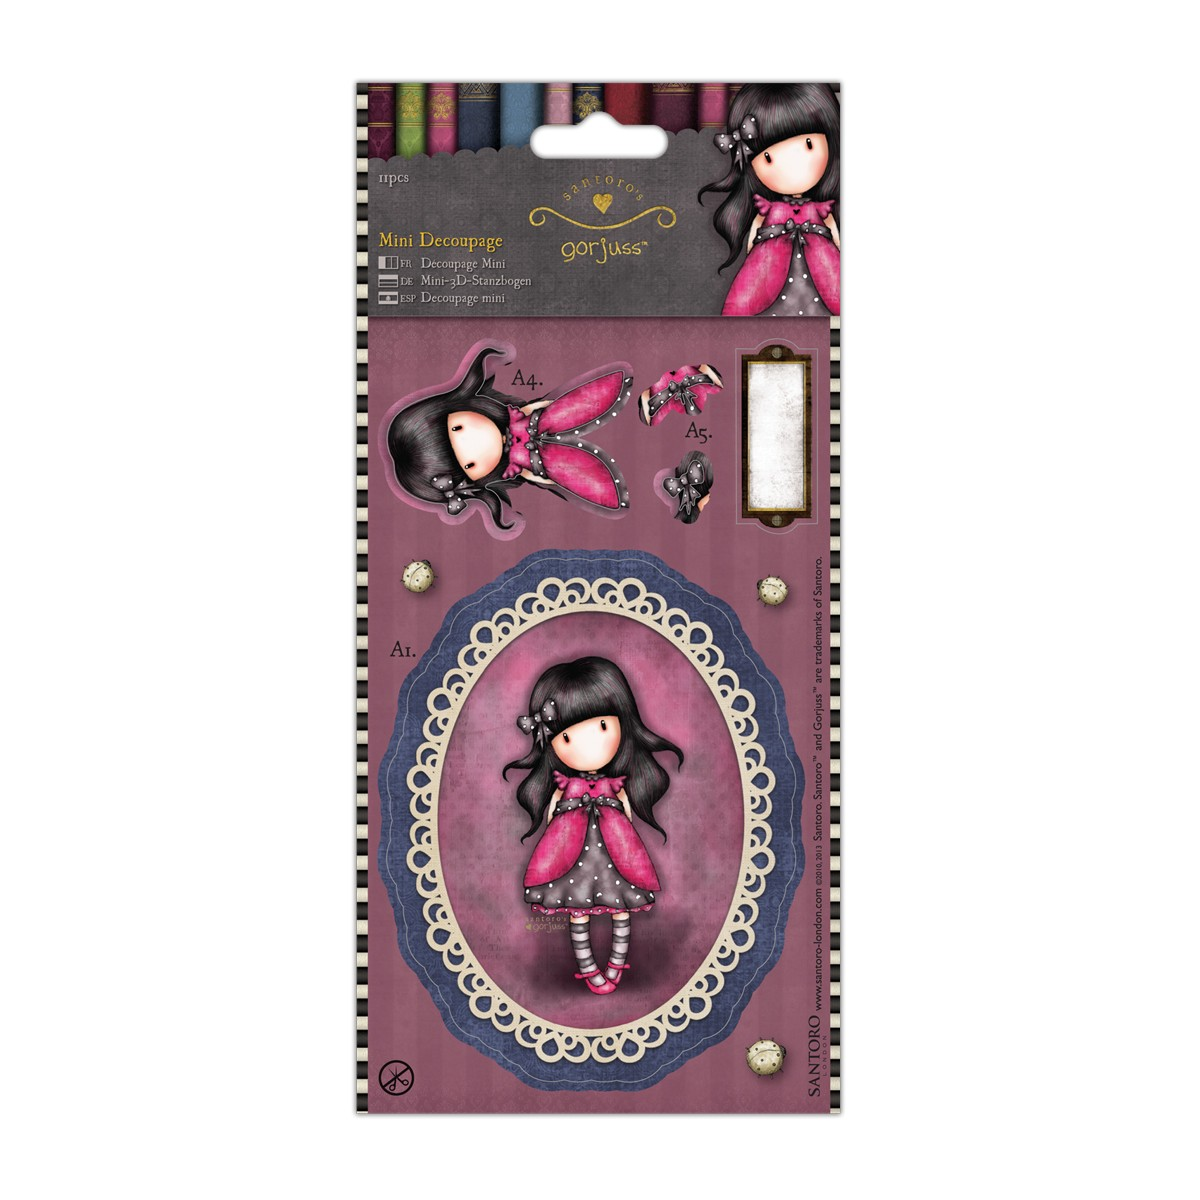 Mini Decoupage  Simply Gorjuss - Ladybird  - JuJu Scrapbook